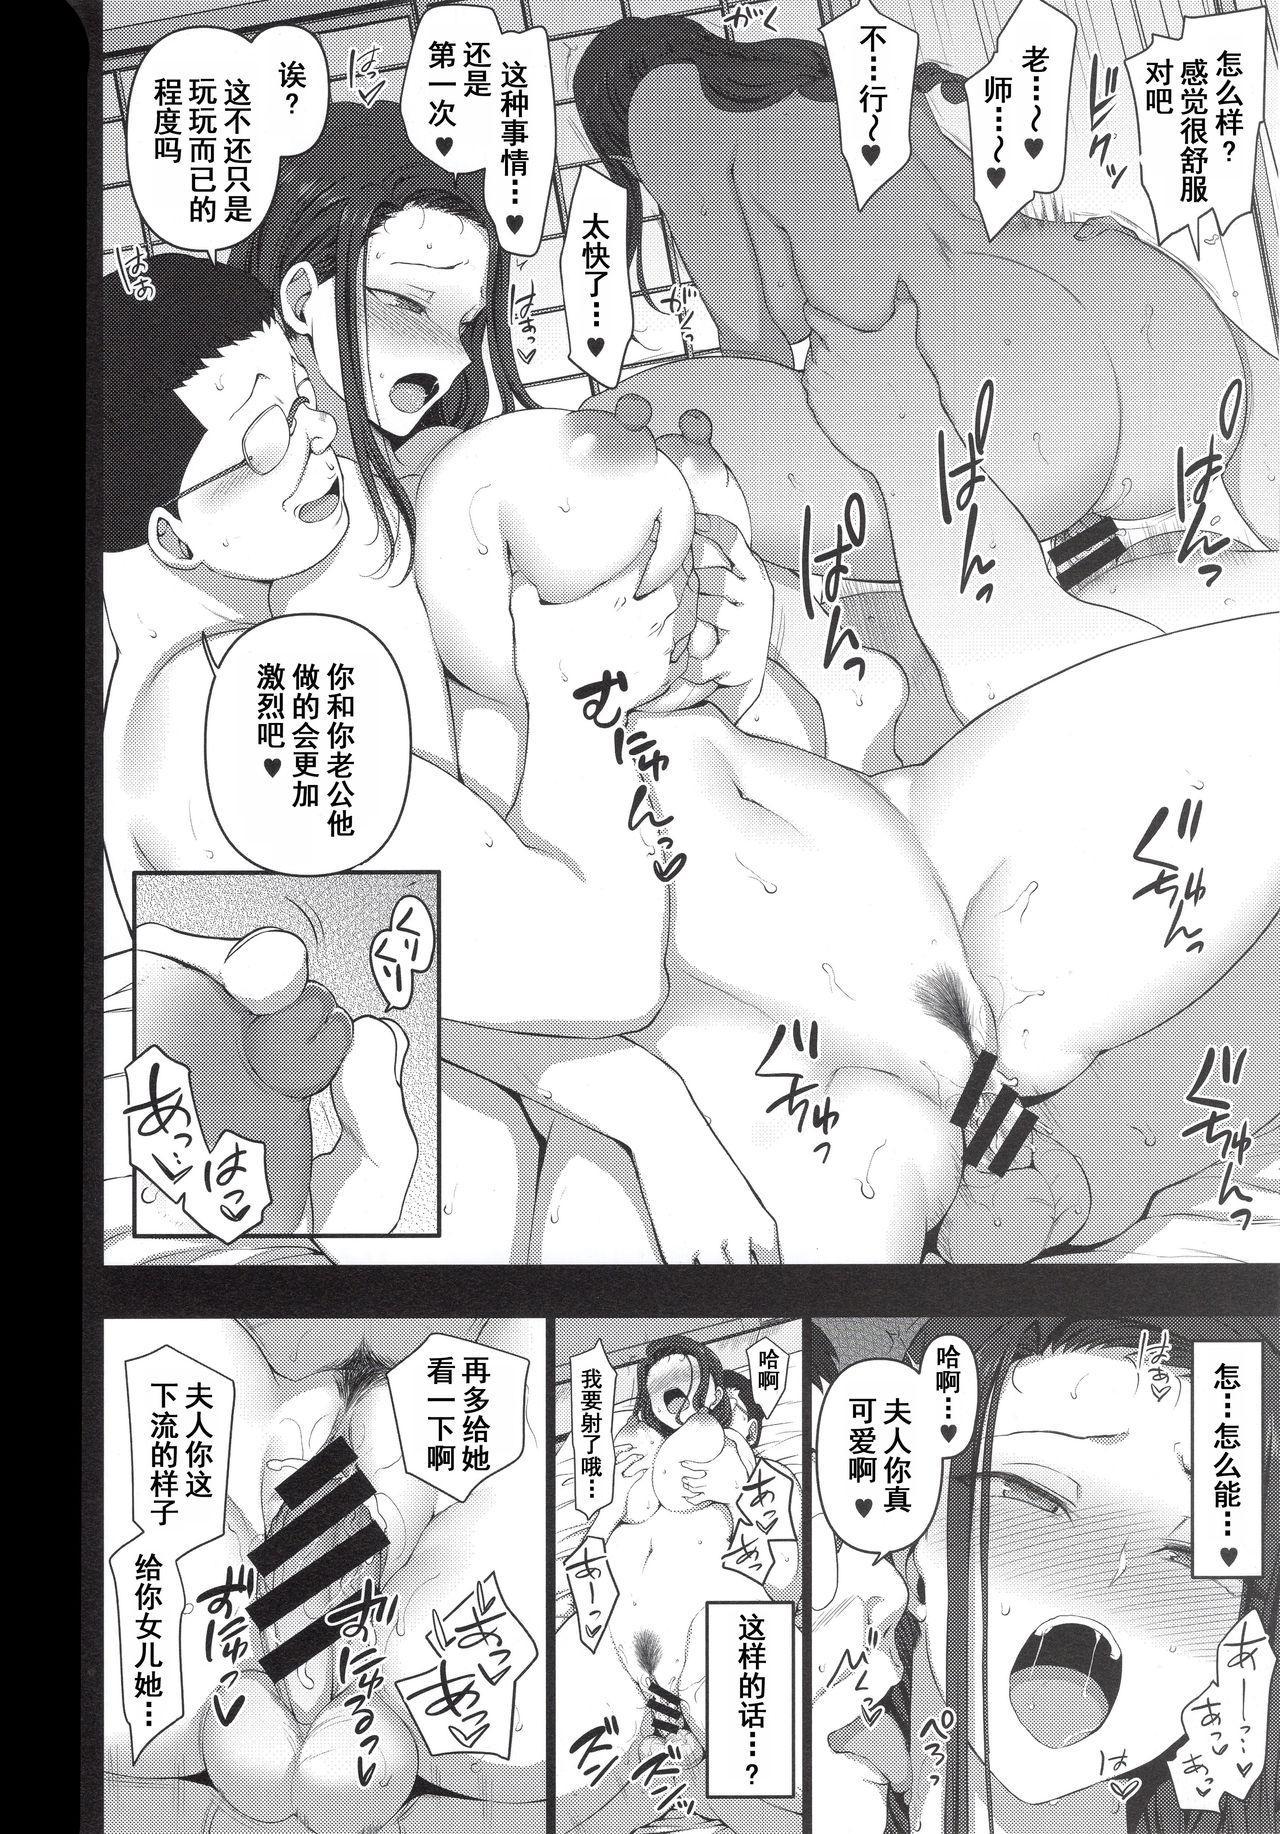 Saimin Seishidou 4: Ninshin Taiken Shidou 23